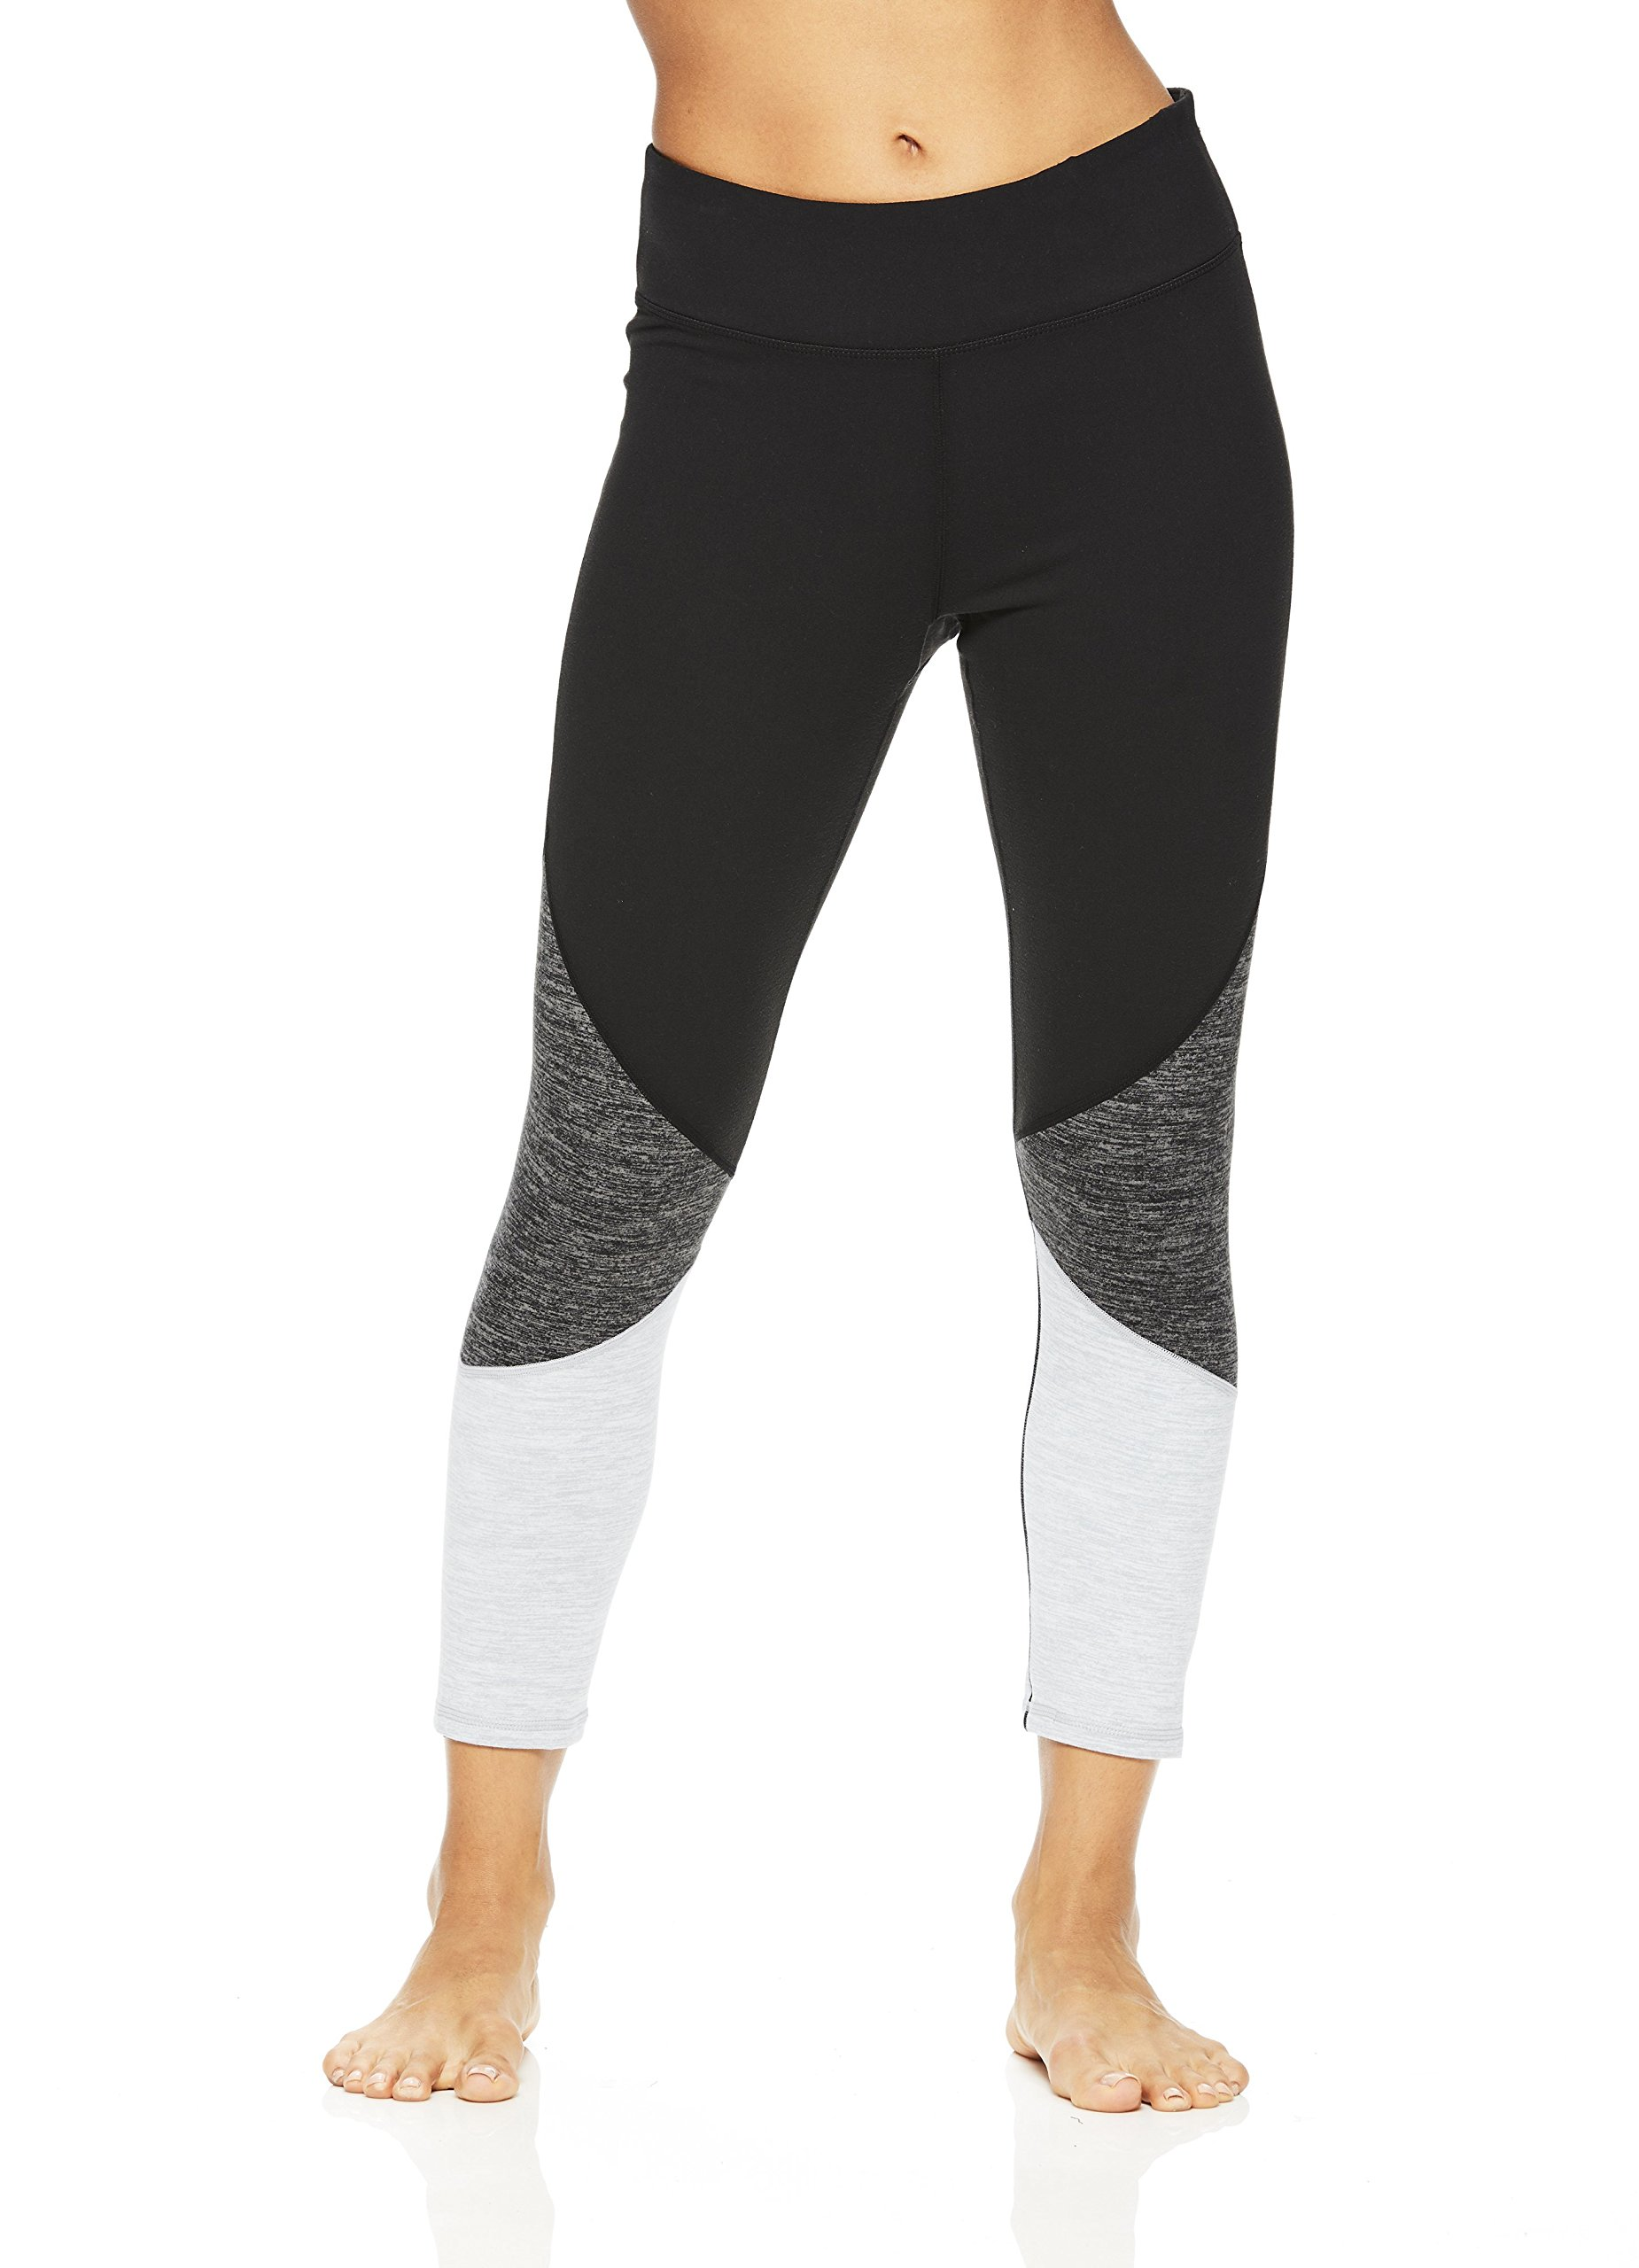 Gaiam Women's Capri Yoga Pants - Performance Spandex Compression Legging - Black Heather Mix, X-Small